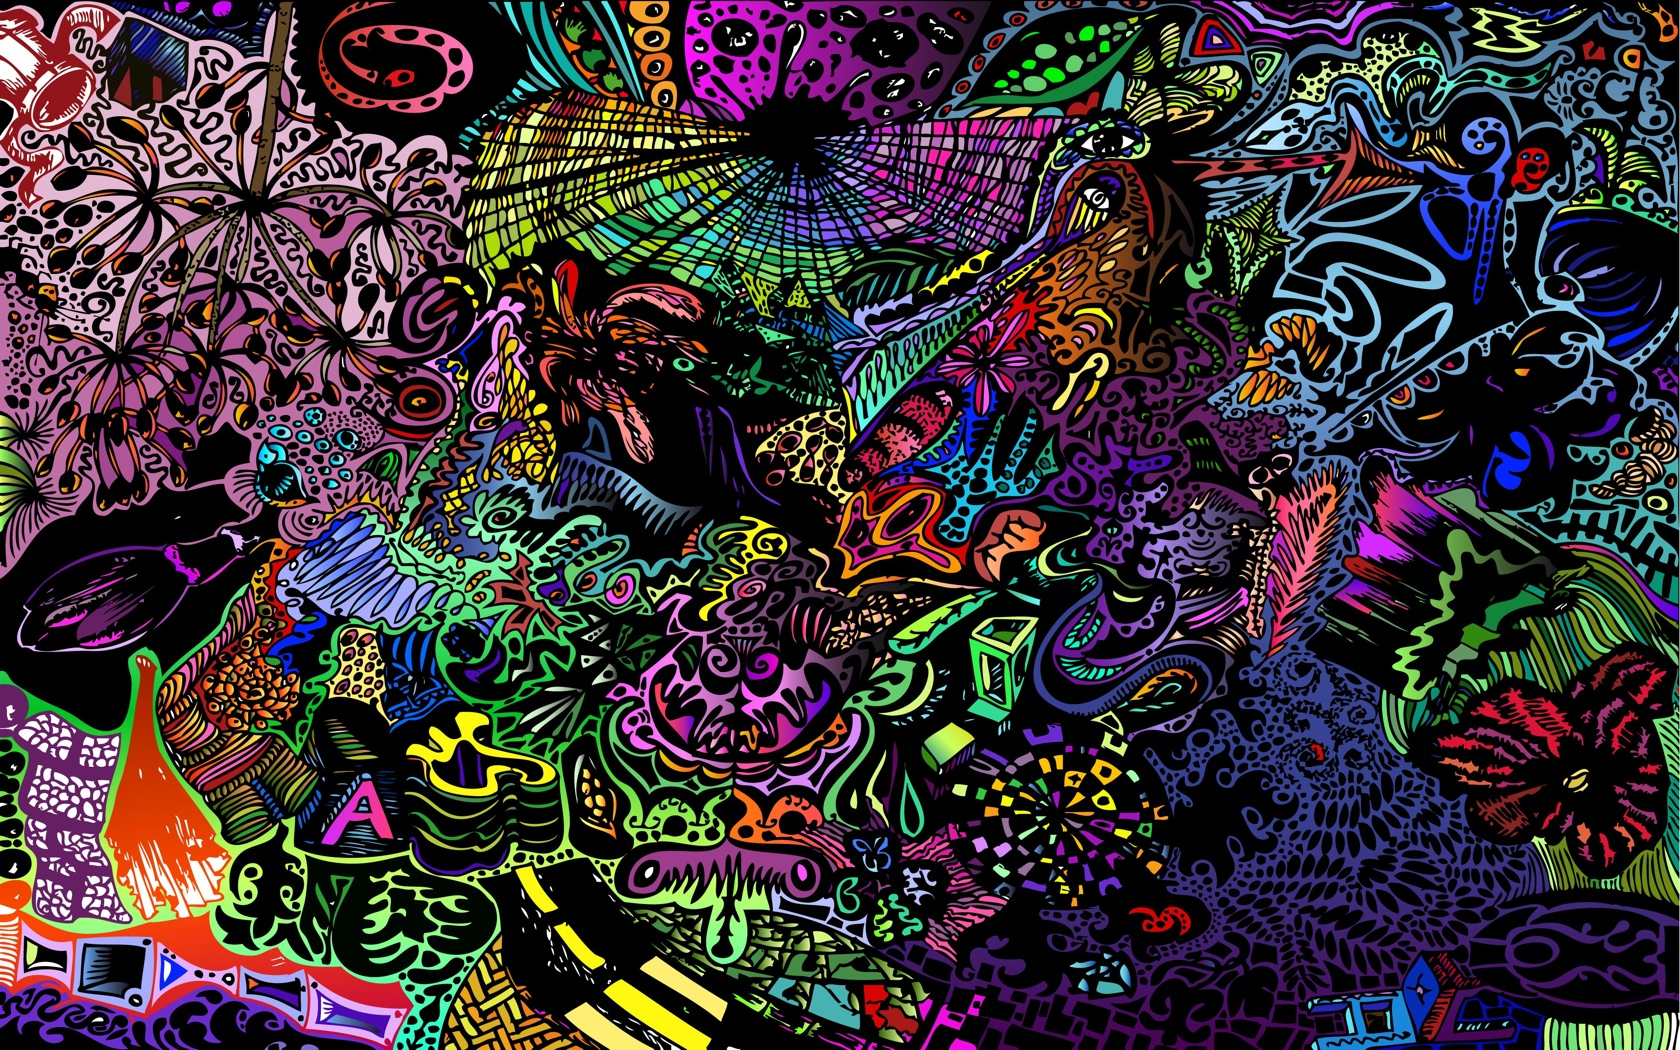 Black Light Wallpaper | Space Wallpapers in Toplist